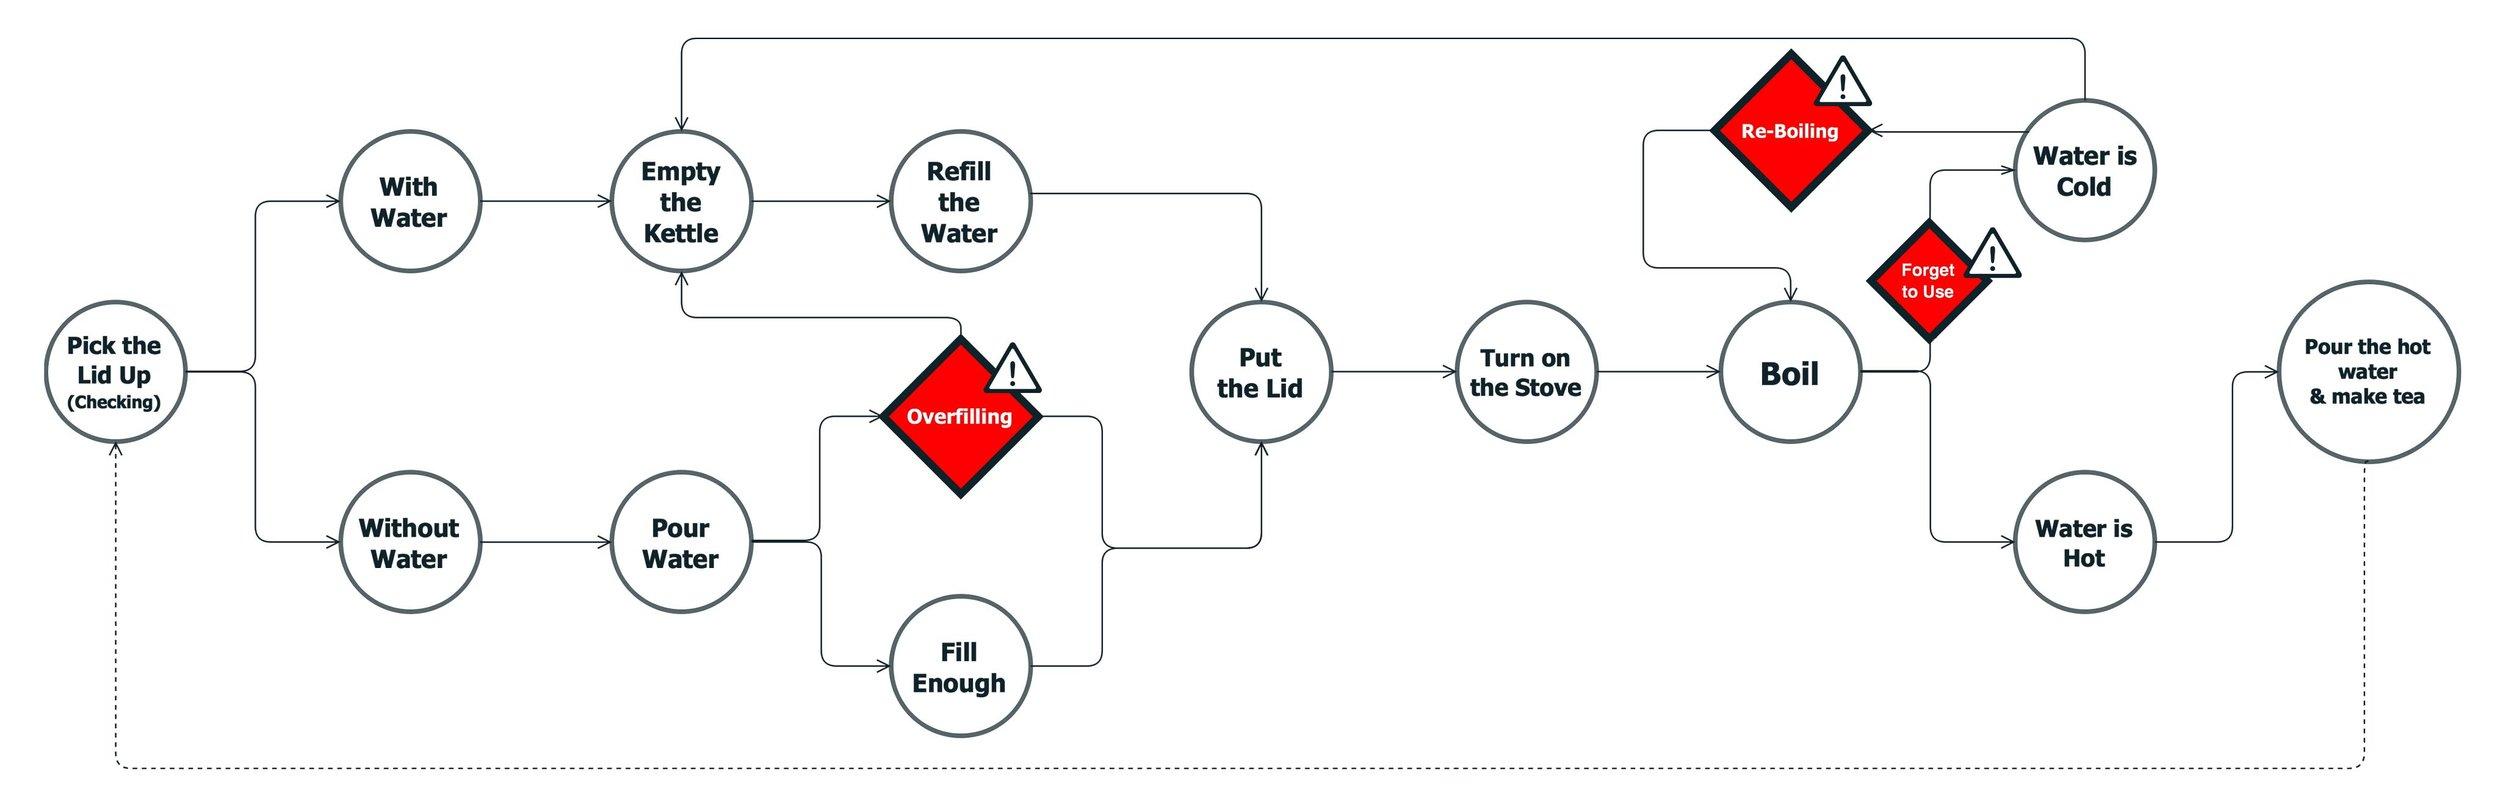 User Experience Task Analysis